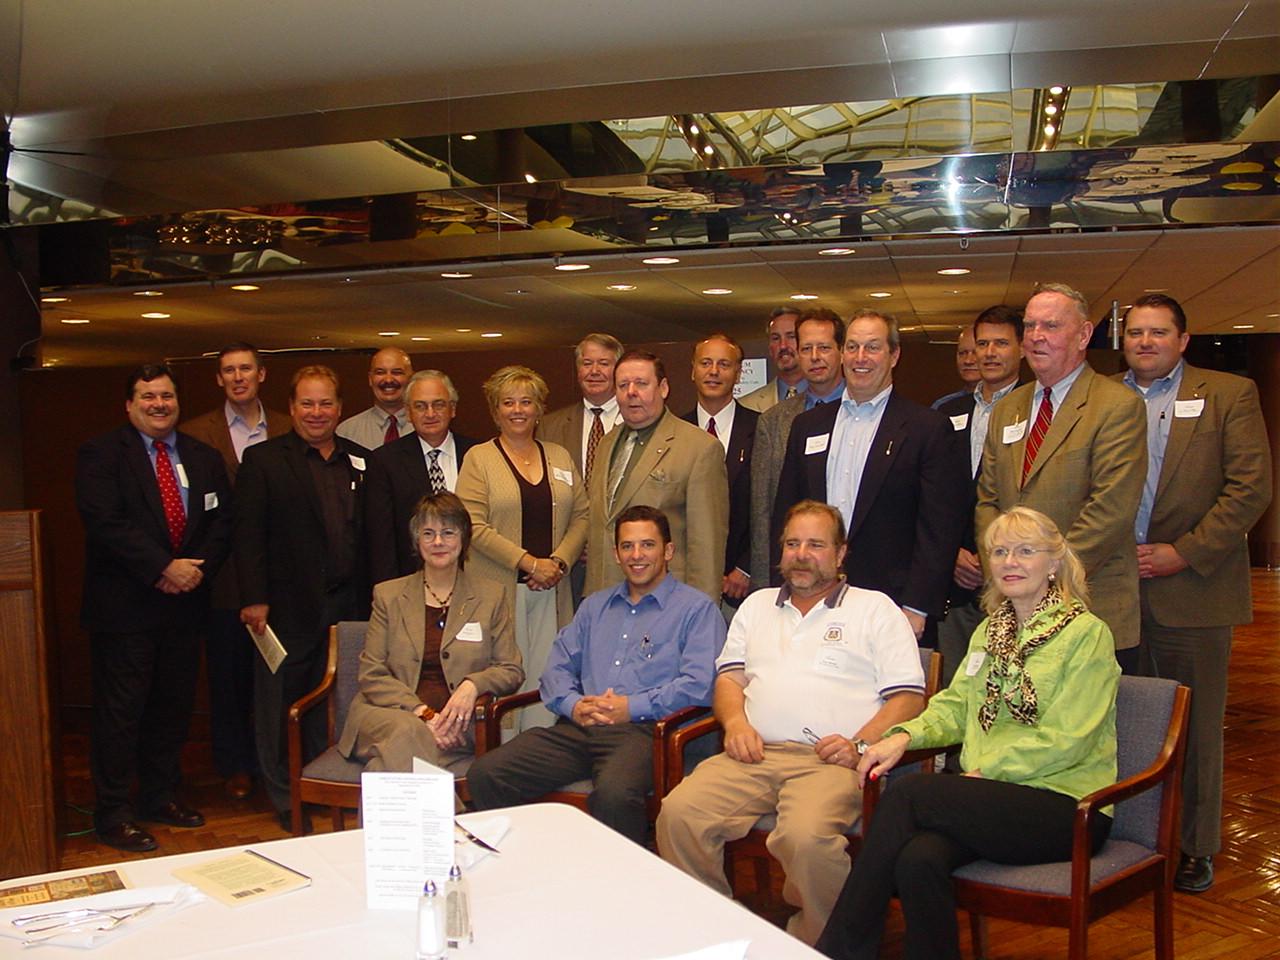 2006 Construction Team Leaders.jpg